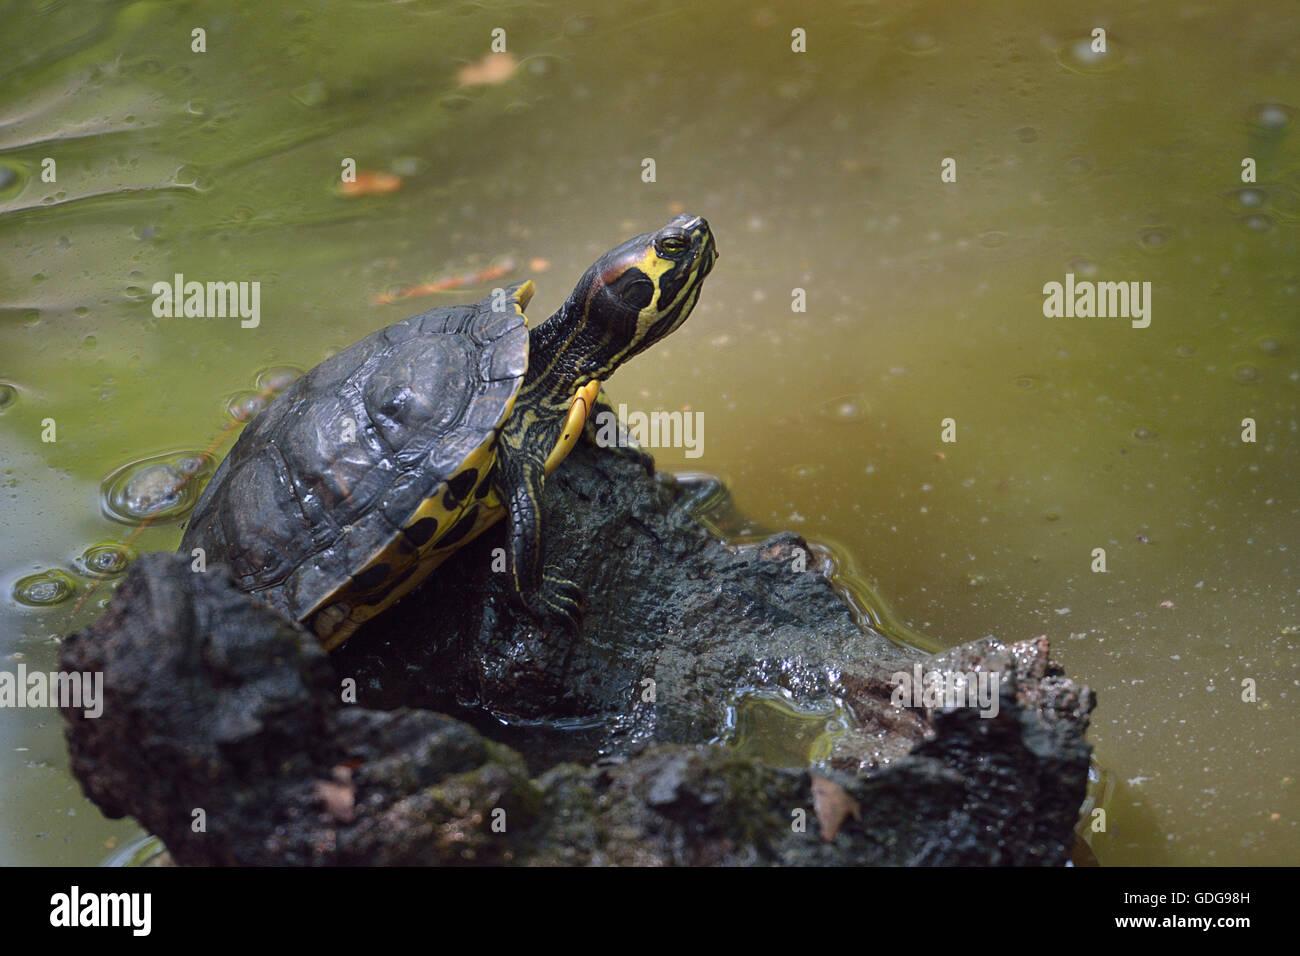 Yellow-bellied slider, Trachemys scripta scripta, Emydidae, Lazio, Italy  aquatic turtle turtles Roberto Nistri - Stock Image